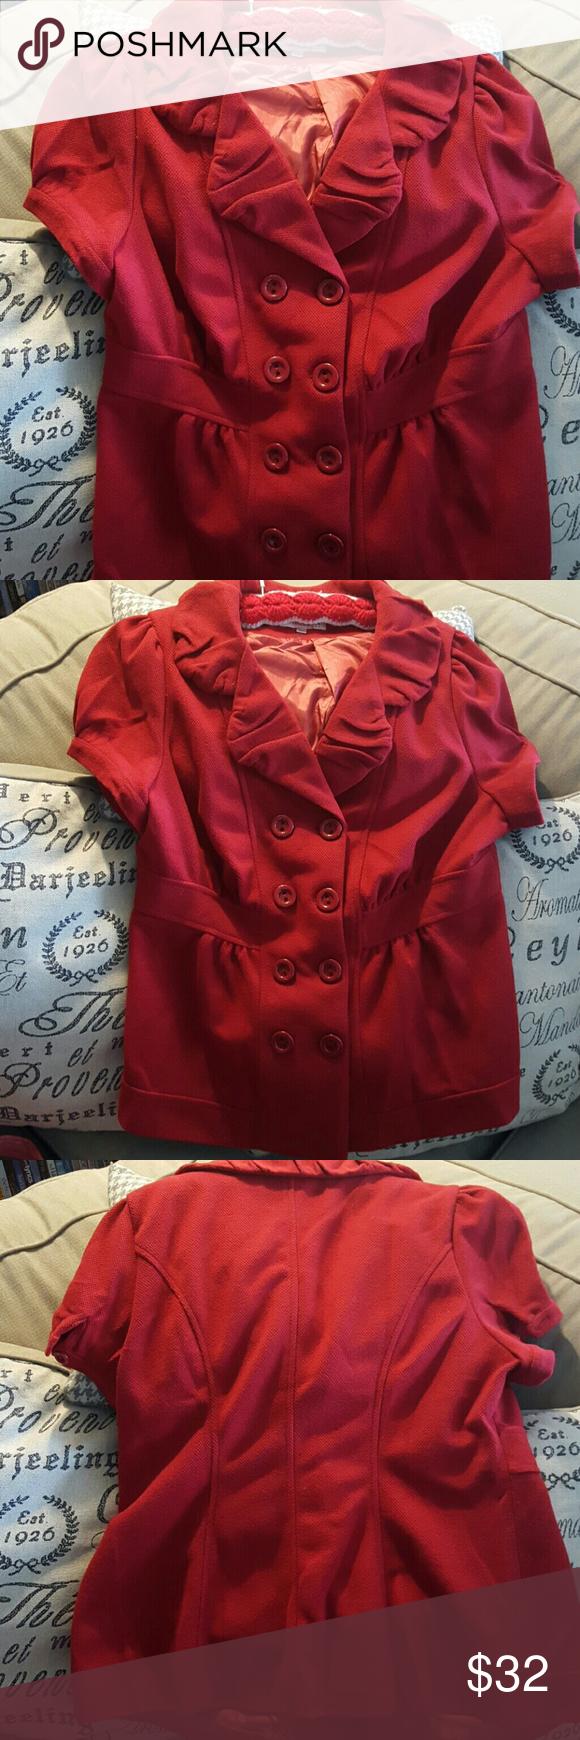 Beautiful deep red blazer High quality cap sleeve woman's blazer, double breastfed, ruffle collar. Marked 3x but I would say it fits more like a 1x. maranka Jackets & Coats Blazers